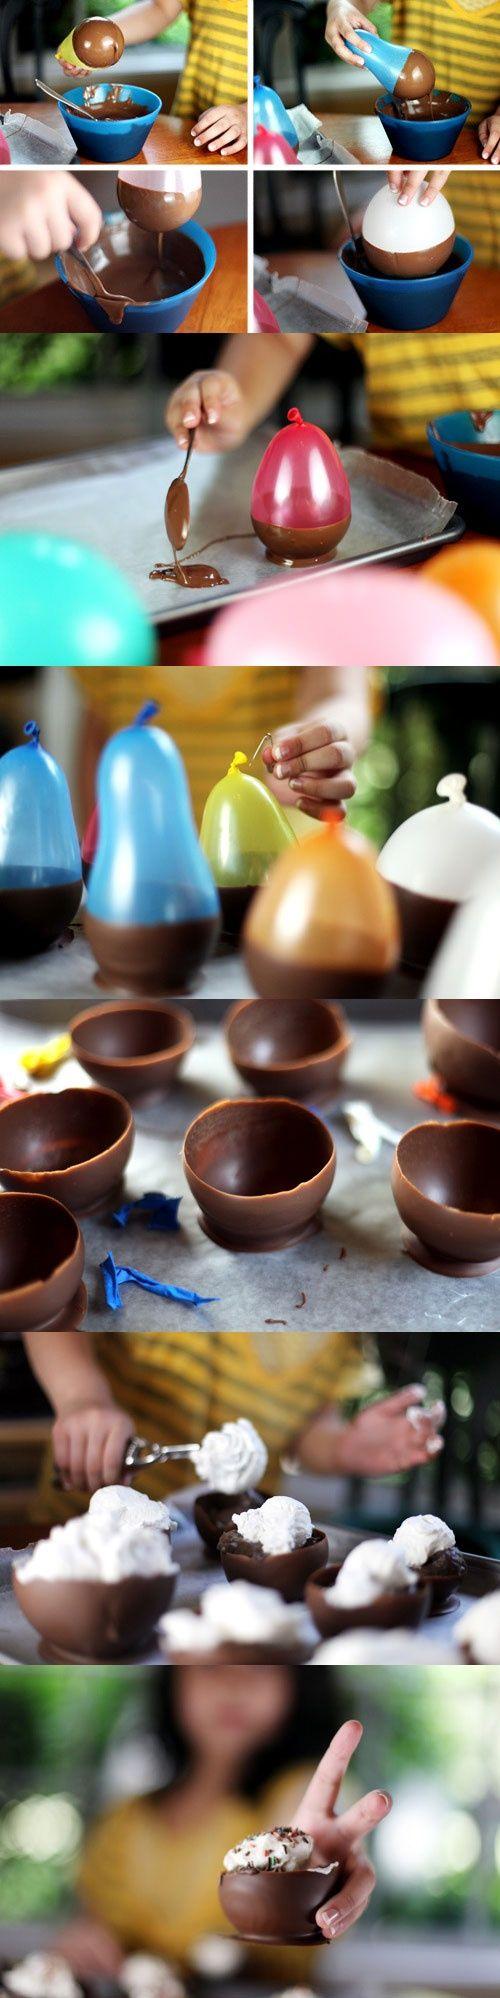 DIY Chocolate Bowls tutorial - genius!